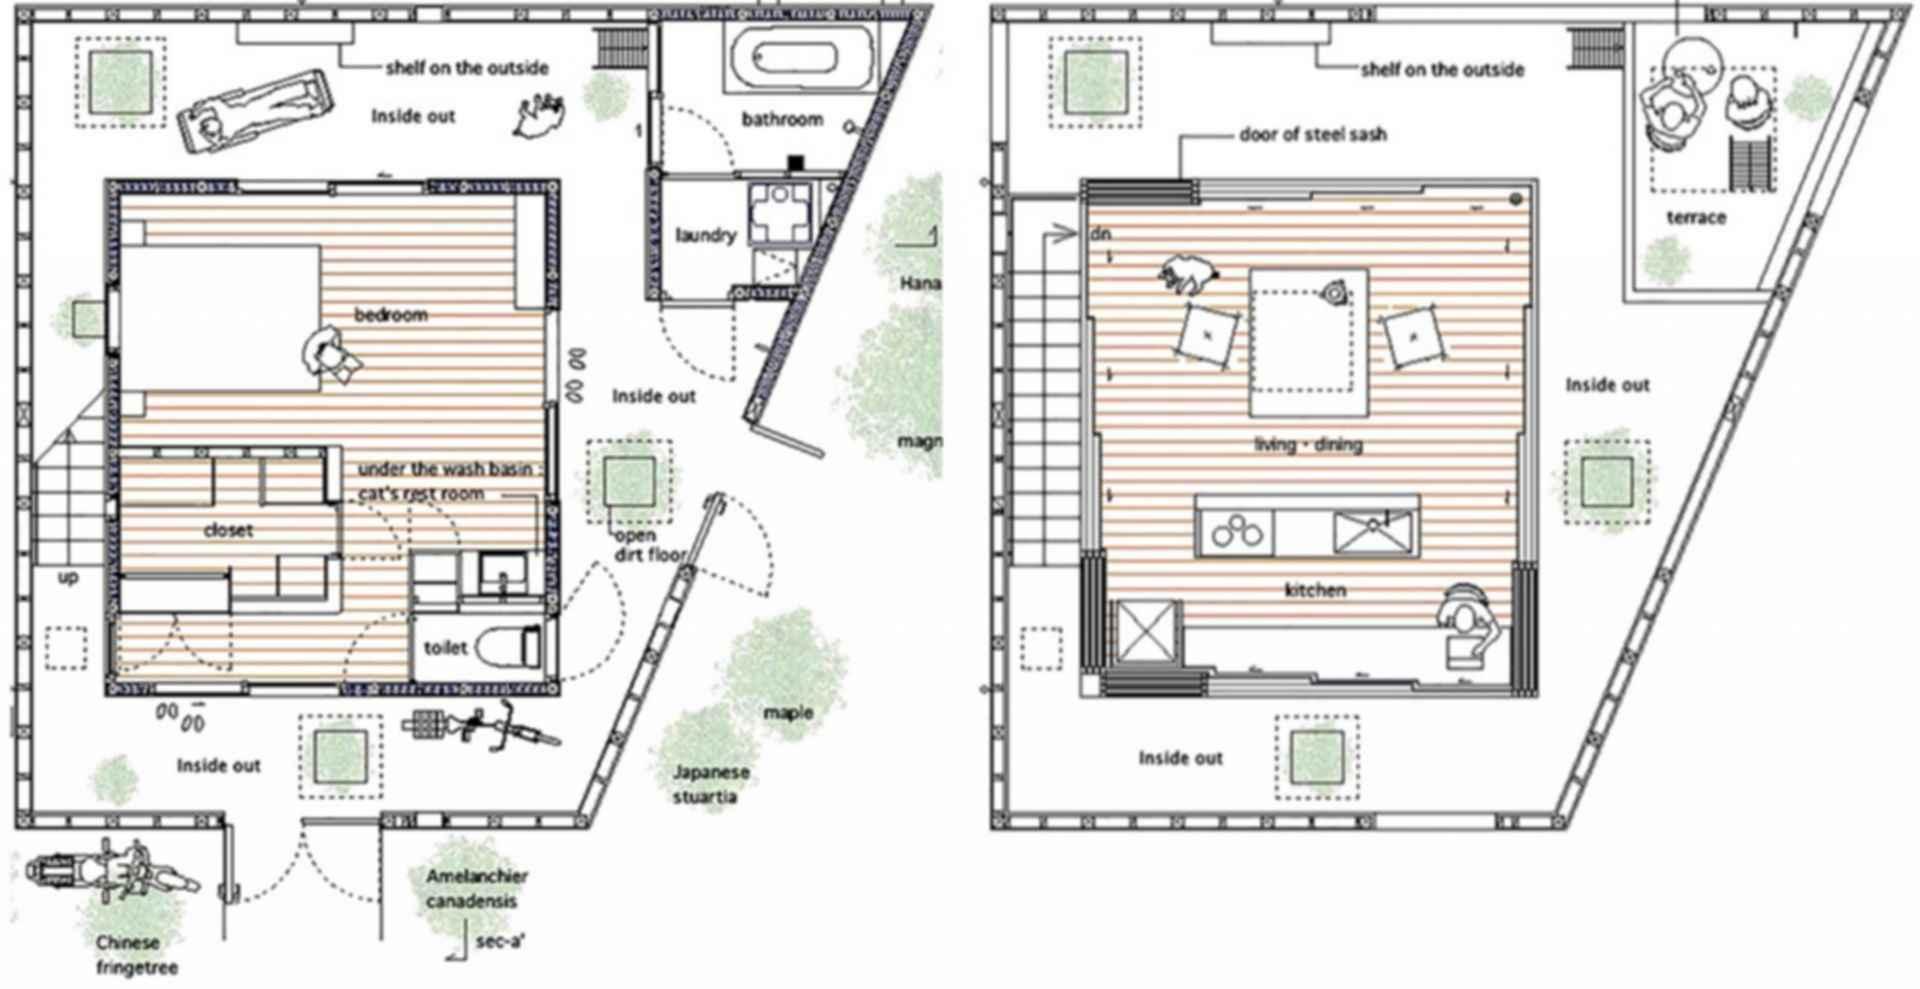 Inside Out - floor plan